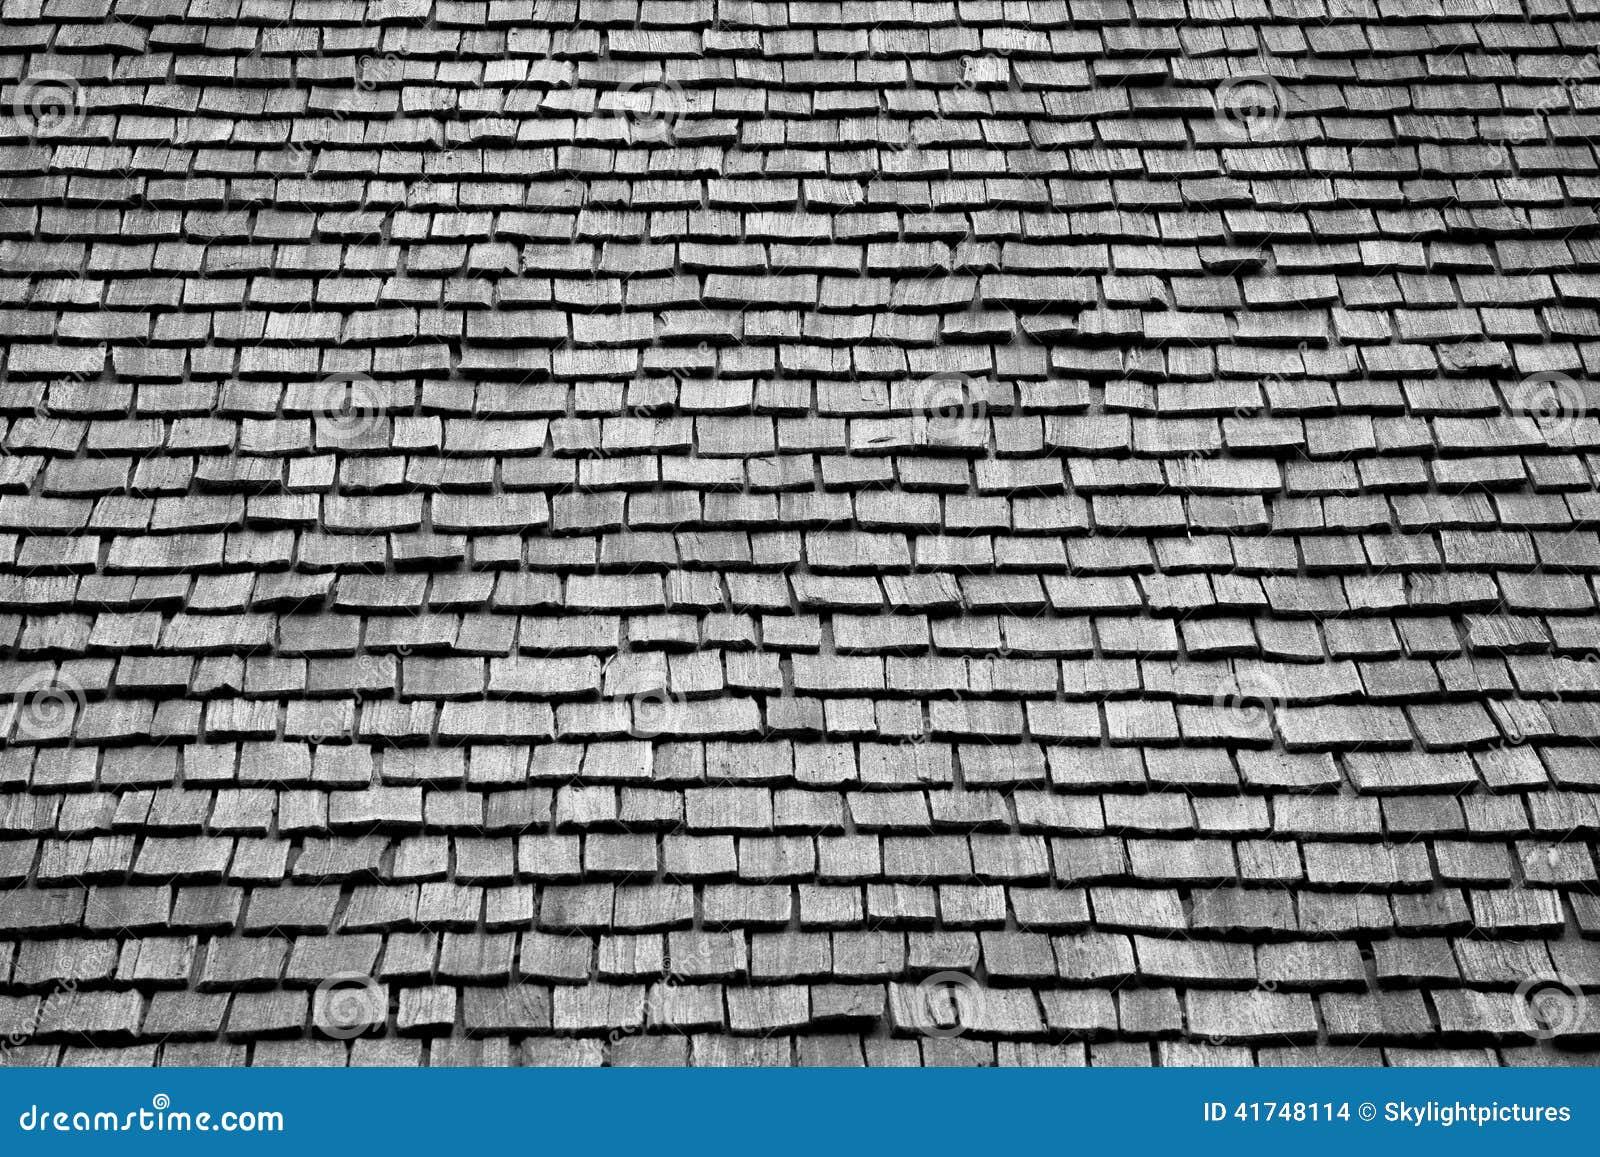 Roof Shingles Stock Photo Image 41748114